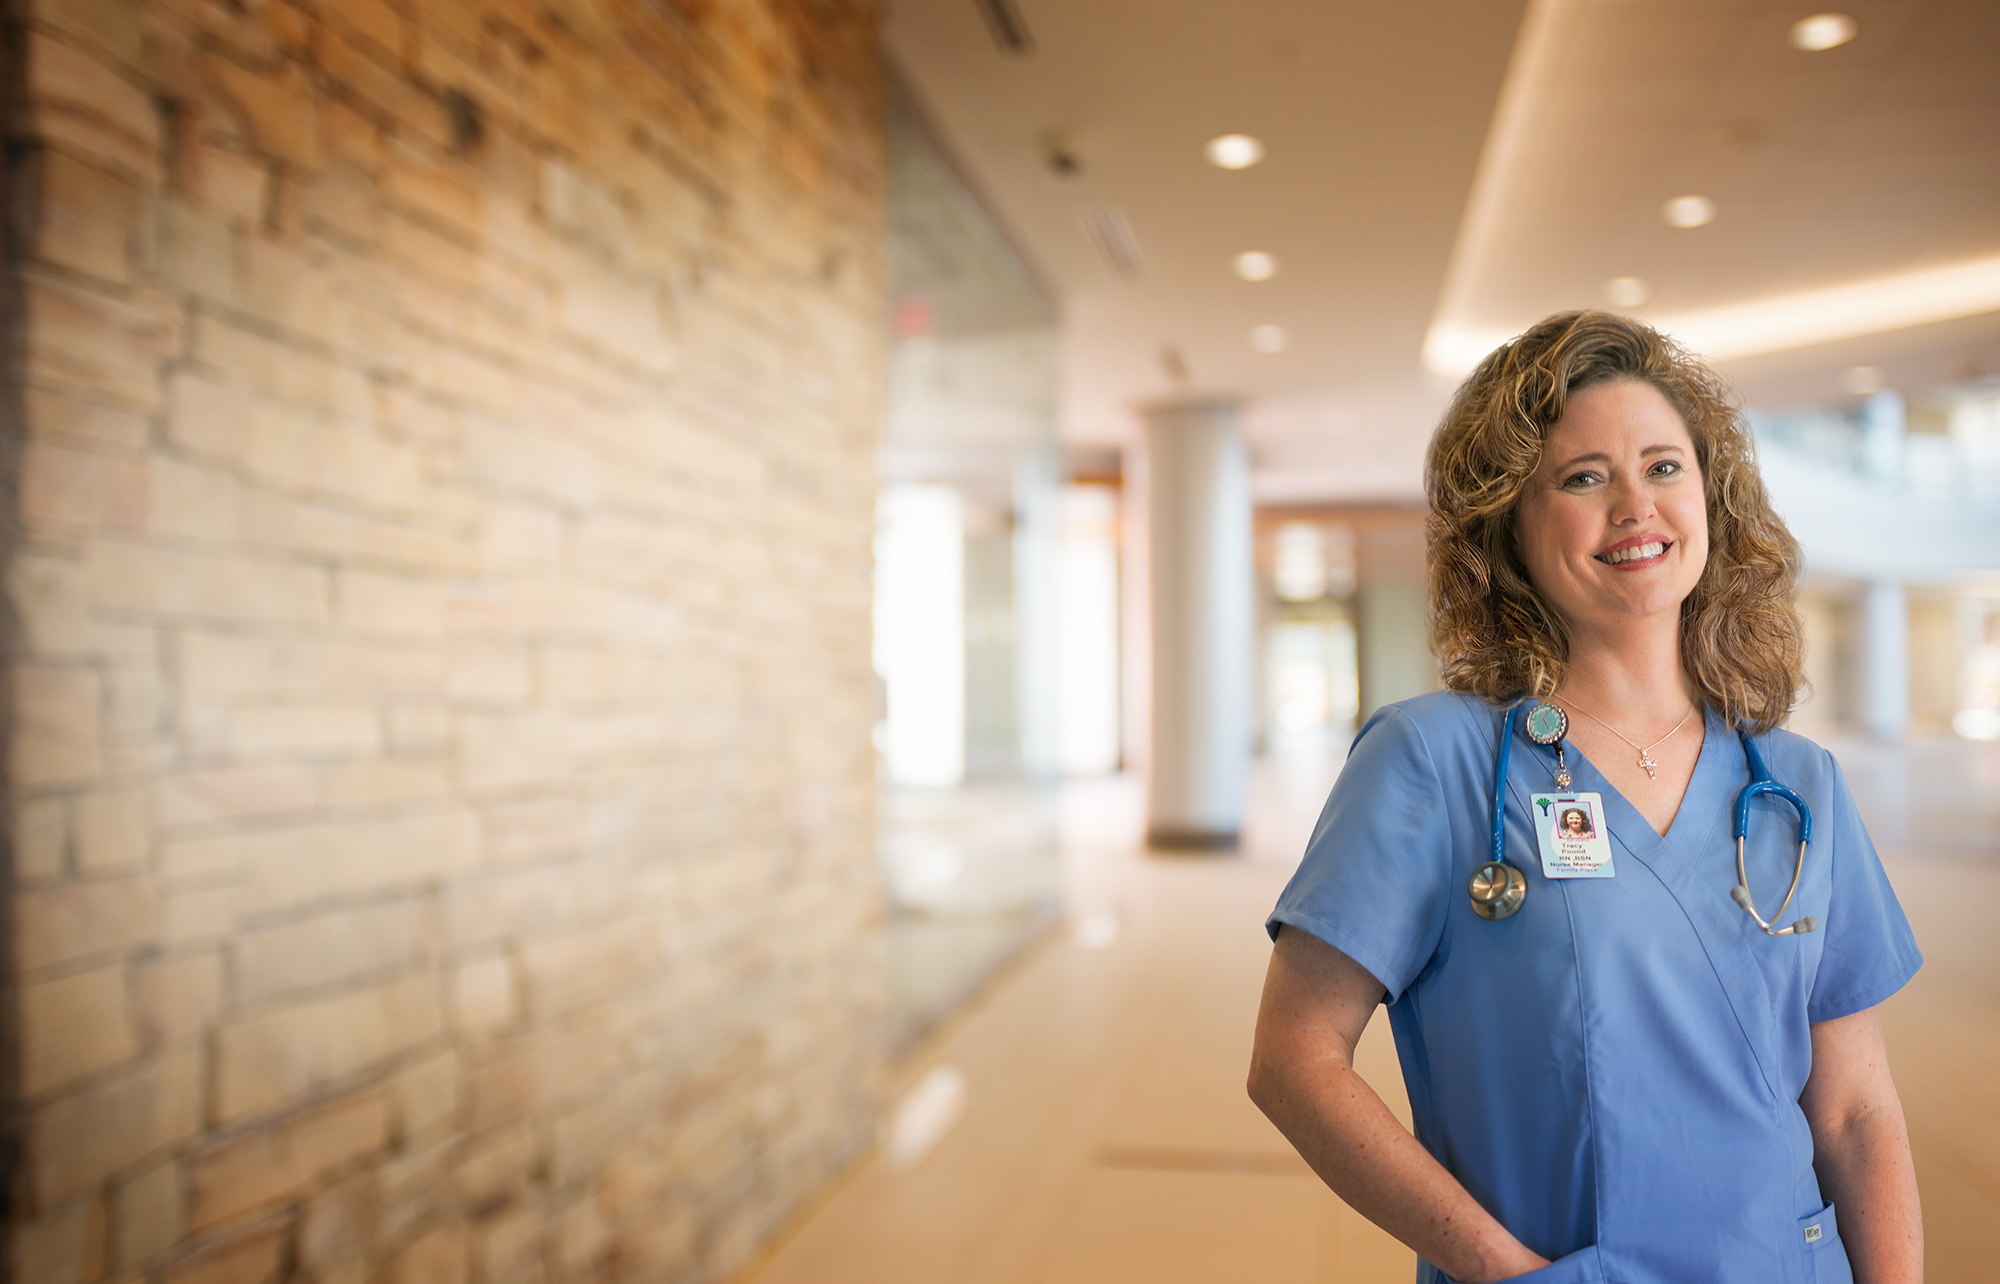 NursePortrait-142MBrochure2_2000px.jpg